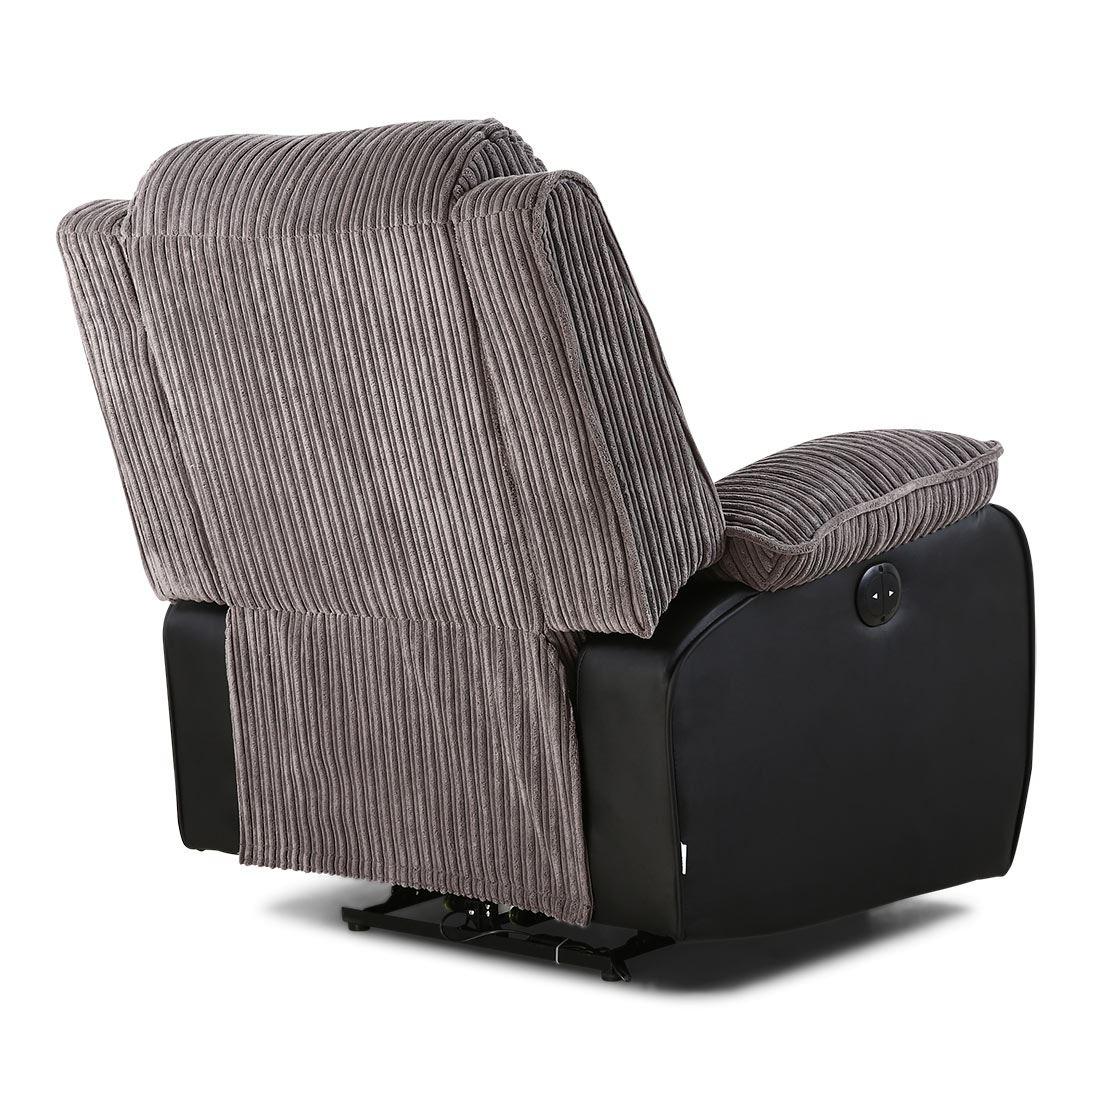 power recliner chairs uk baby tailgate chair postana jumbo cord fabric armchair electric